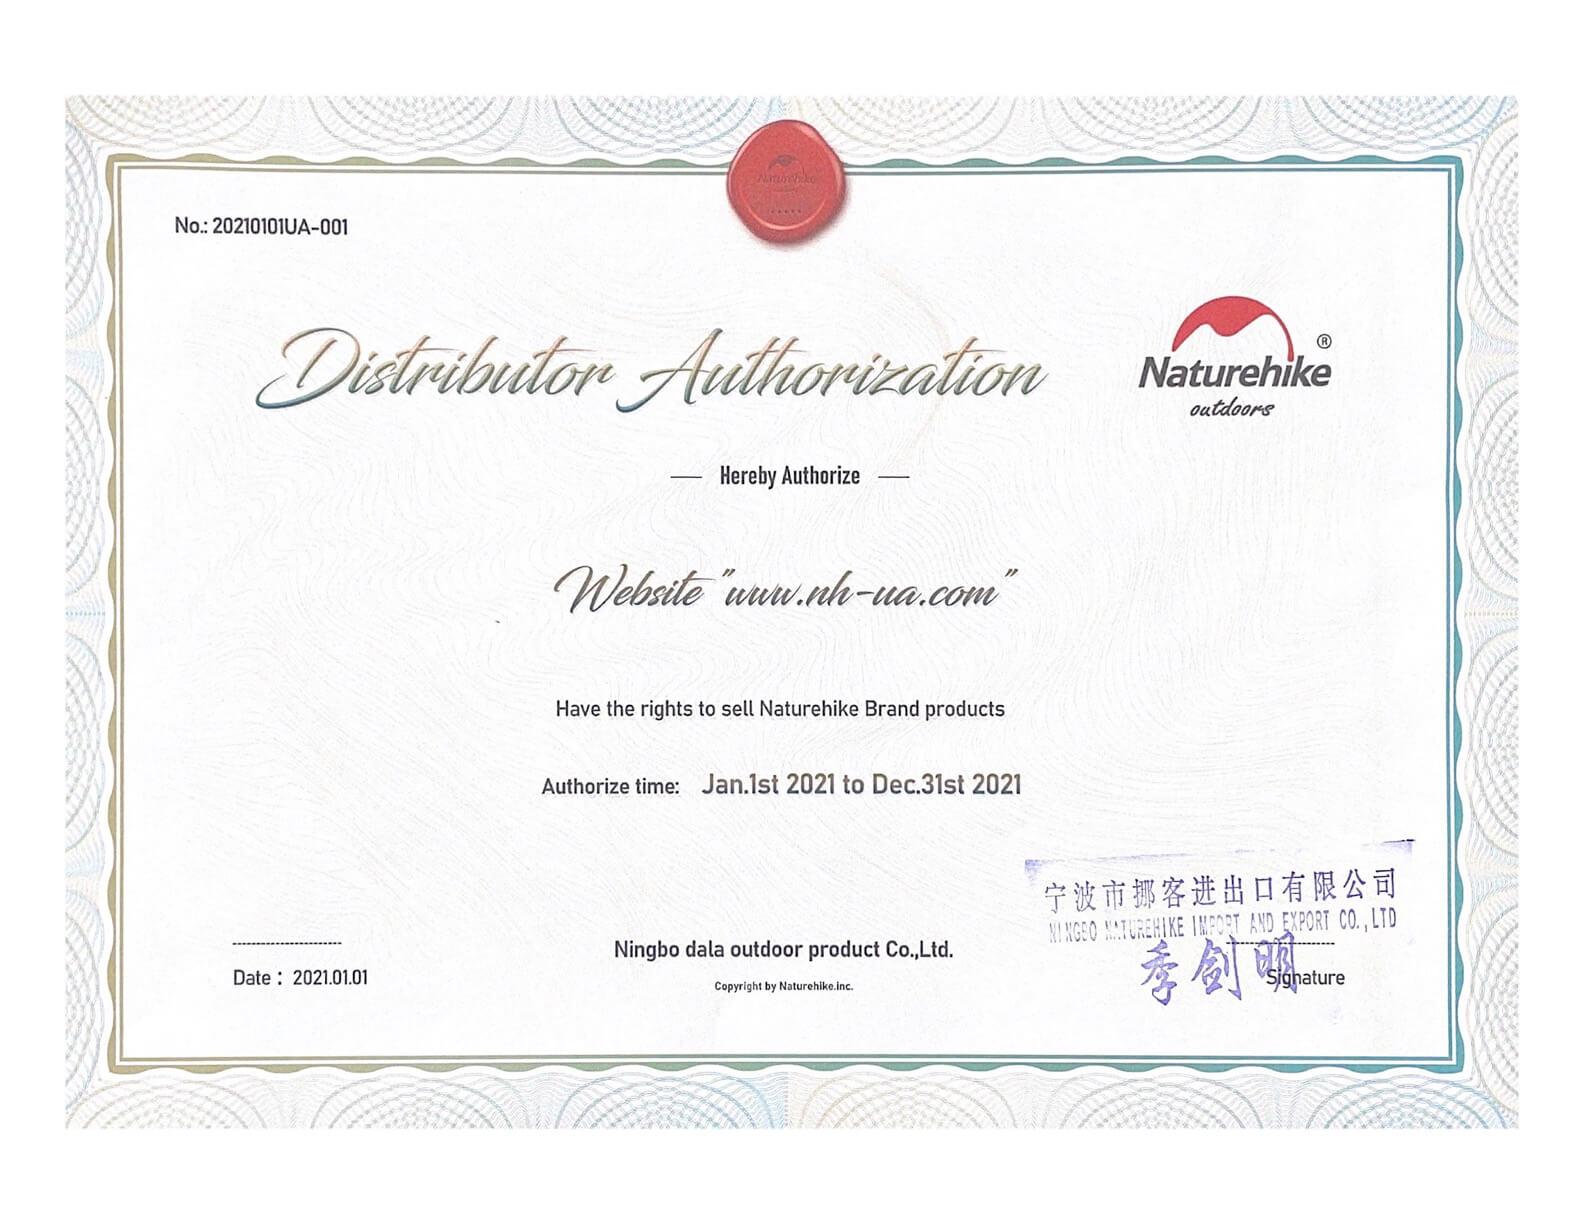 Naturehike certificate